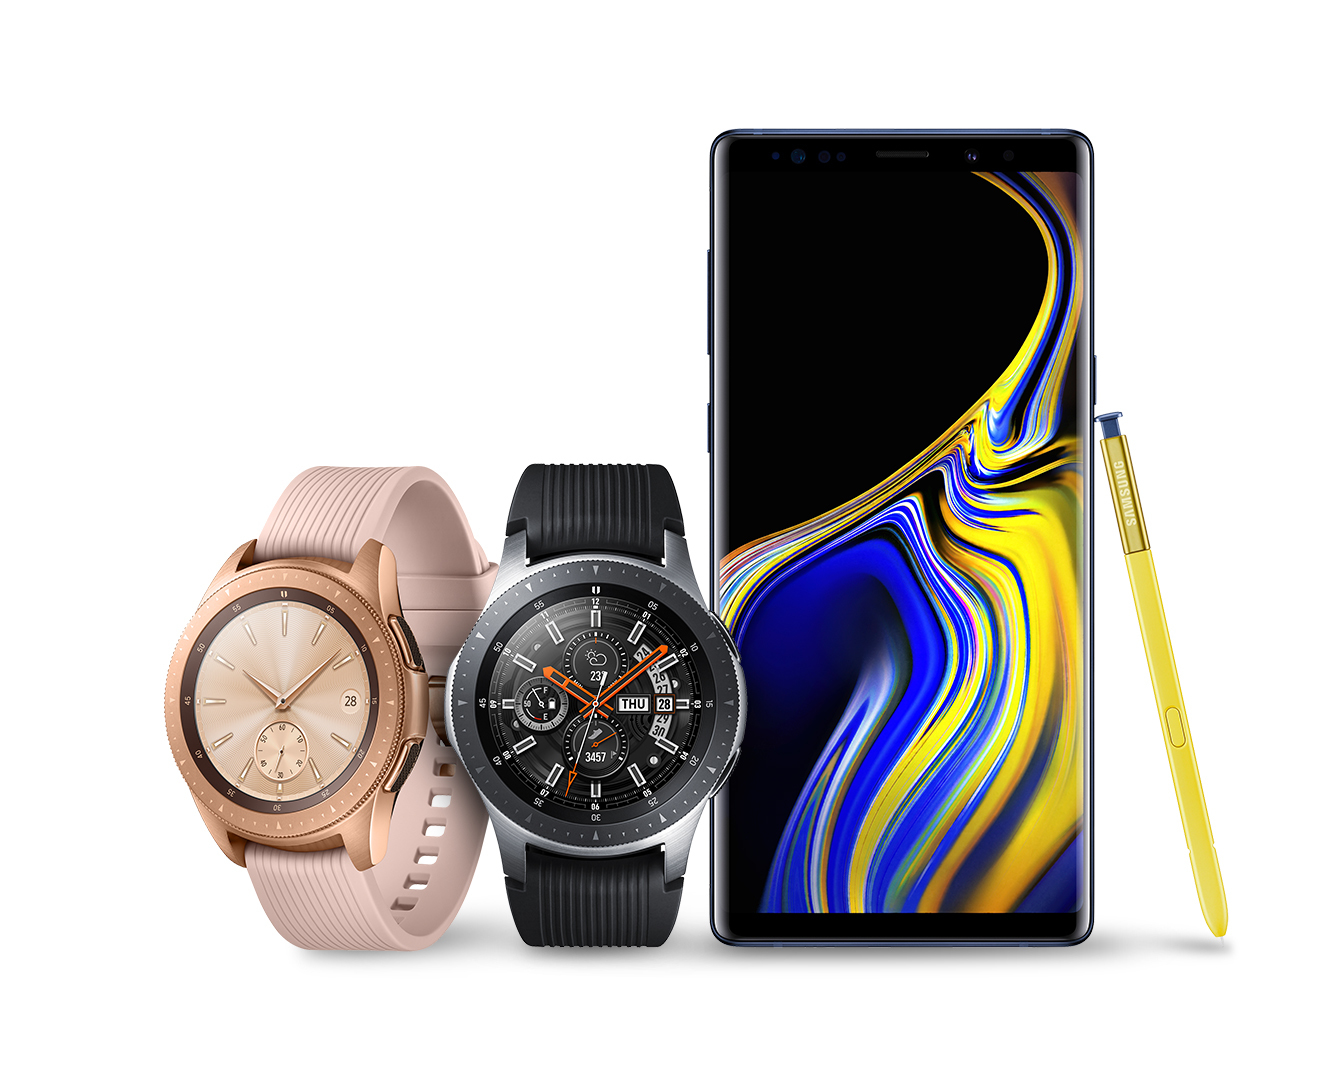 Samsung Galaxy Note 9 with Galaxy Watch